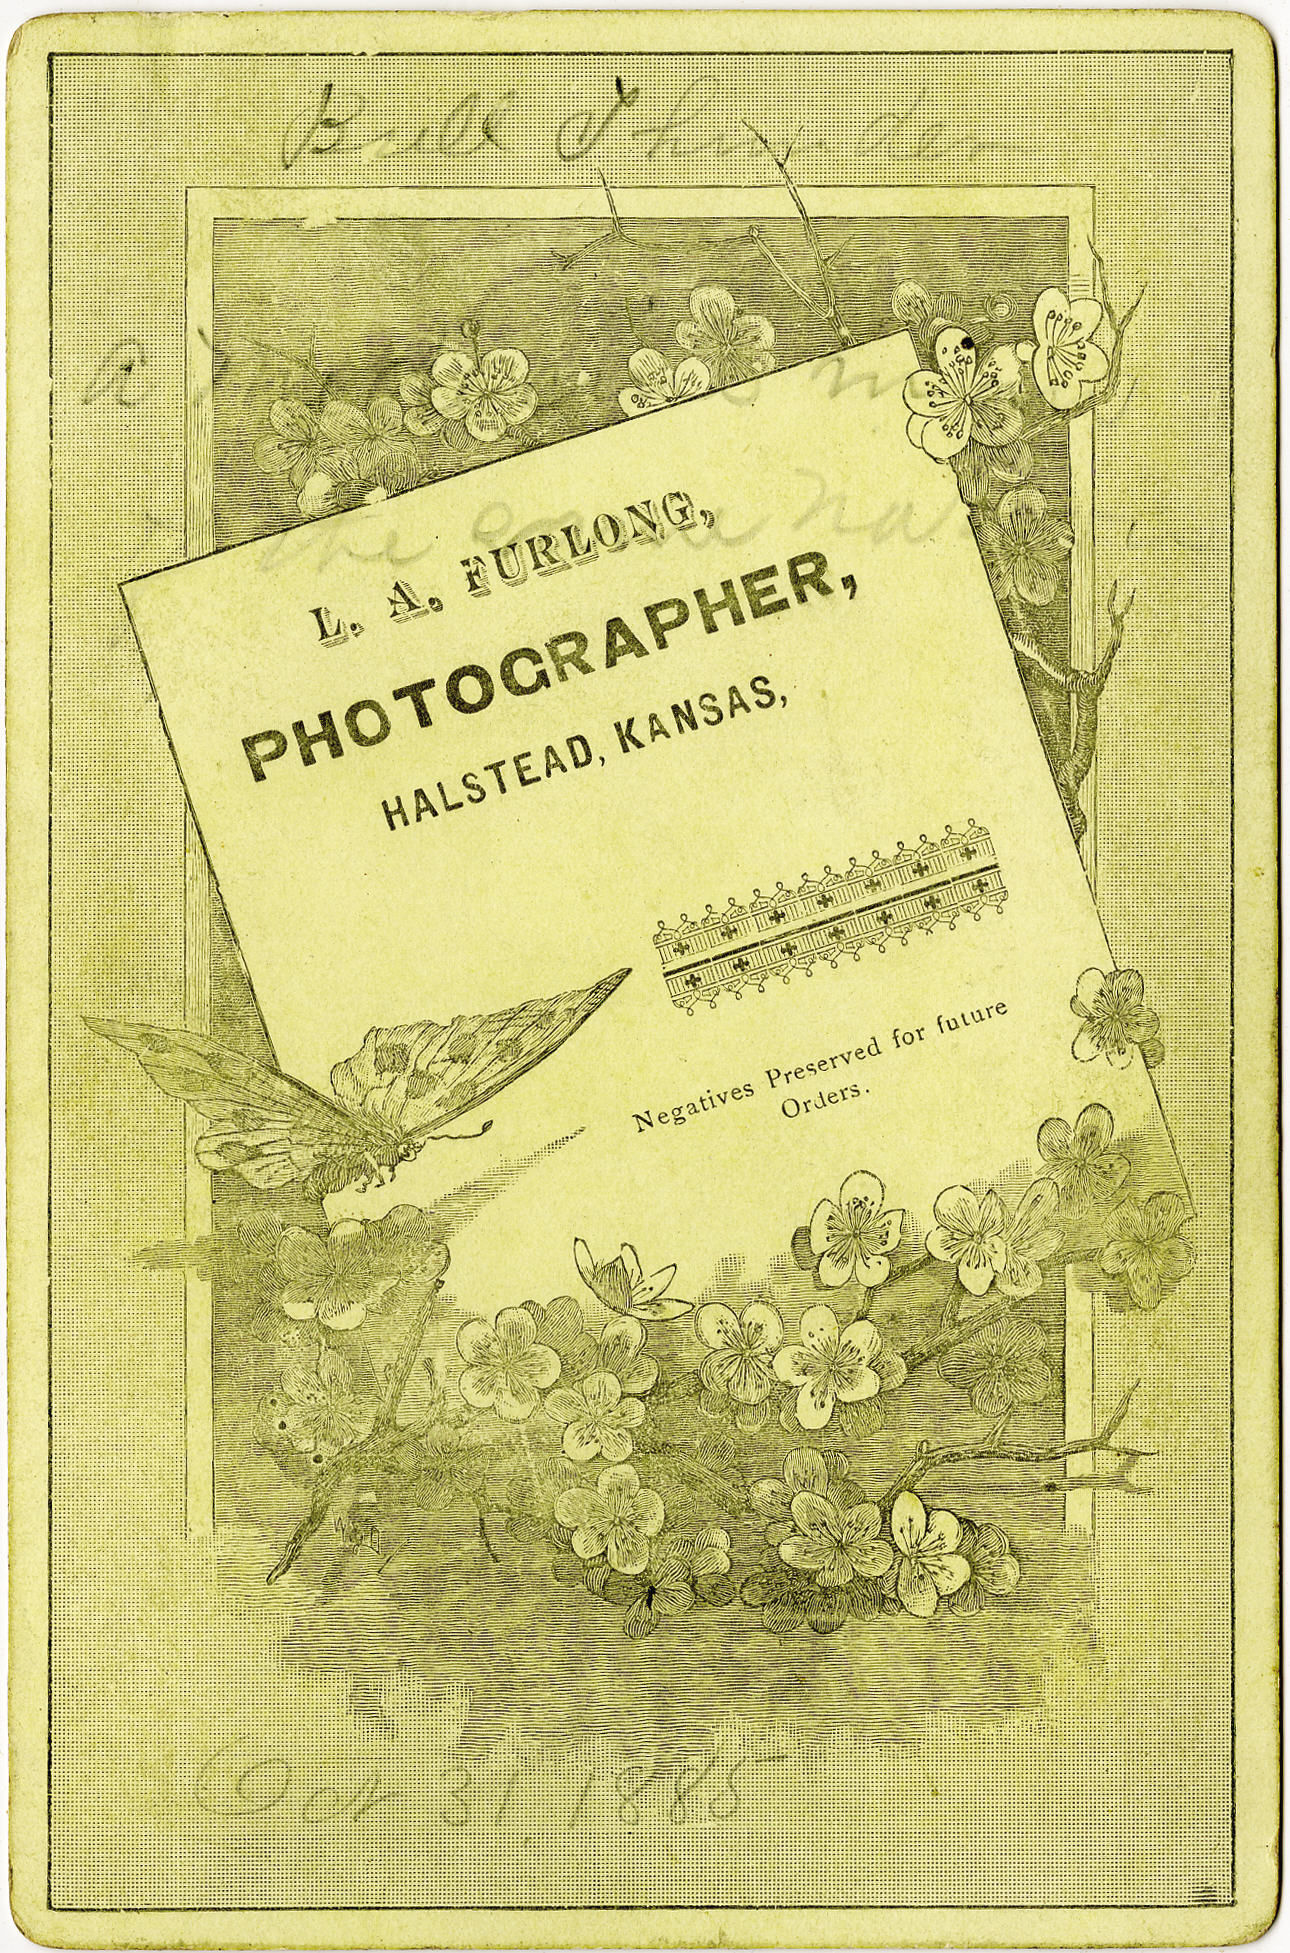 Harvey county photographers archives harvey county historical furlongback 1betcityfo Choice Image